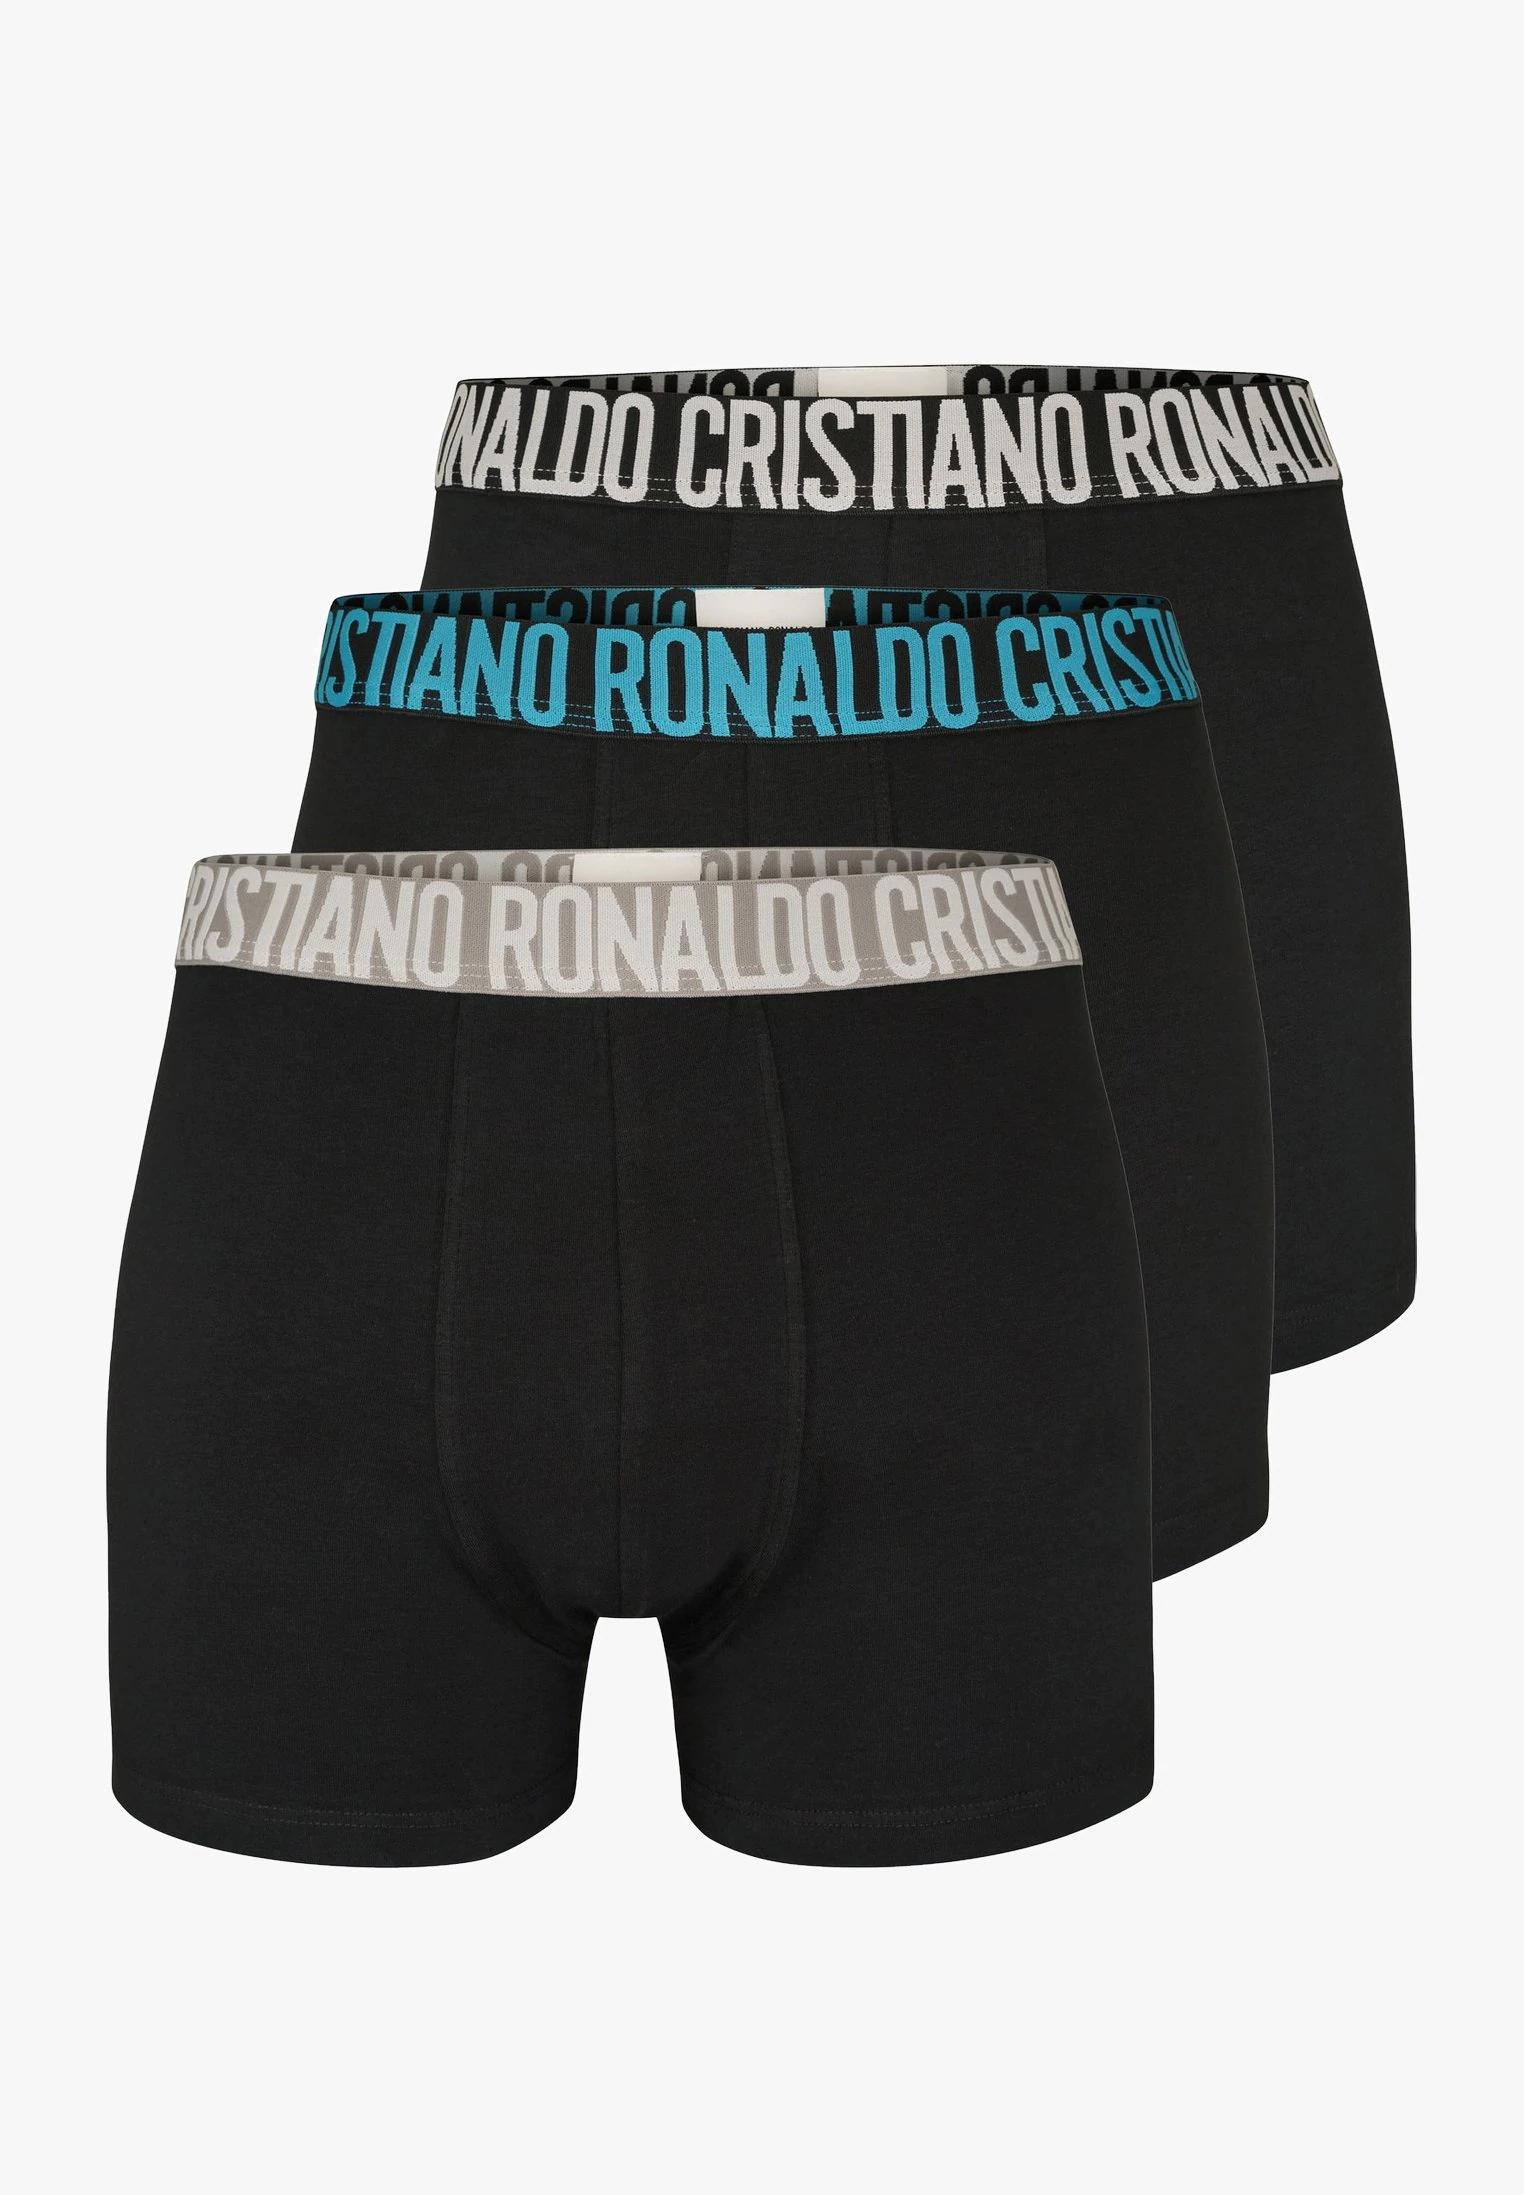 Zalando Christiano Ronaldo CR7 3er Pack Basic Retroshorts / Boxershorts 50% reduziert [S-XXL]